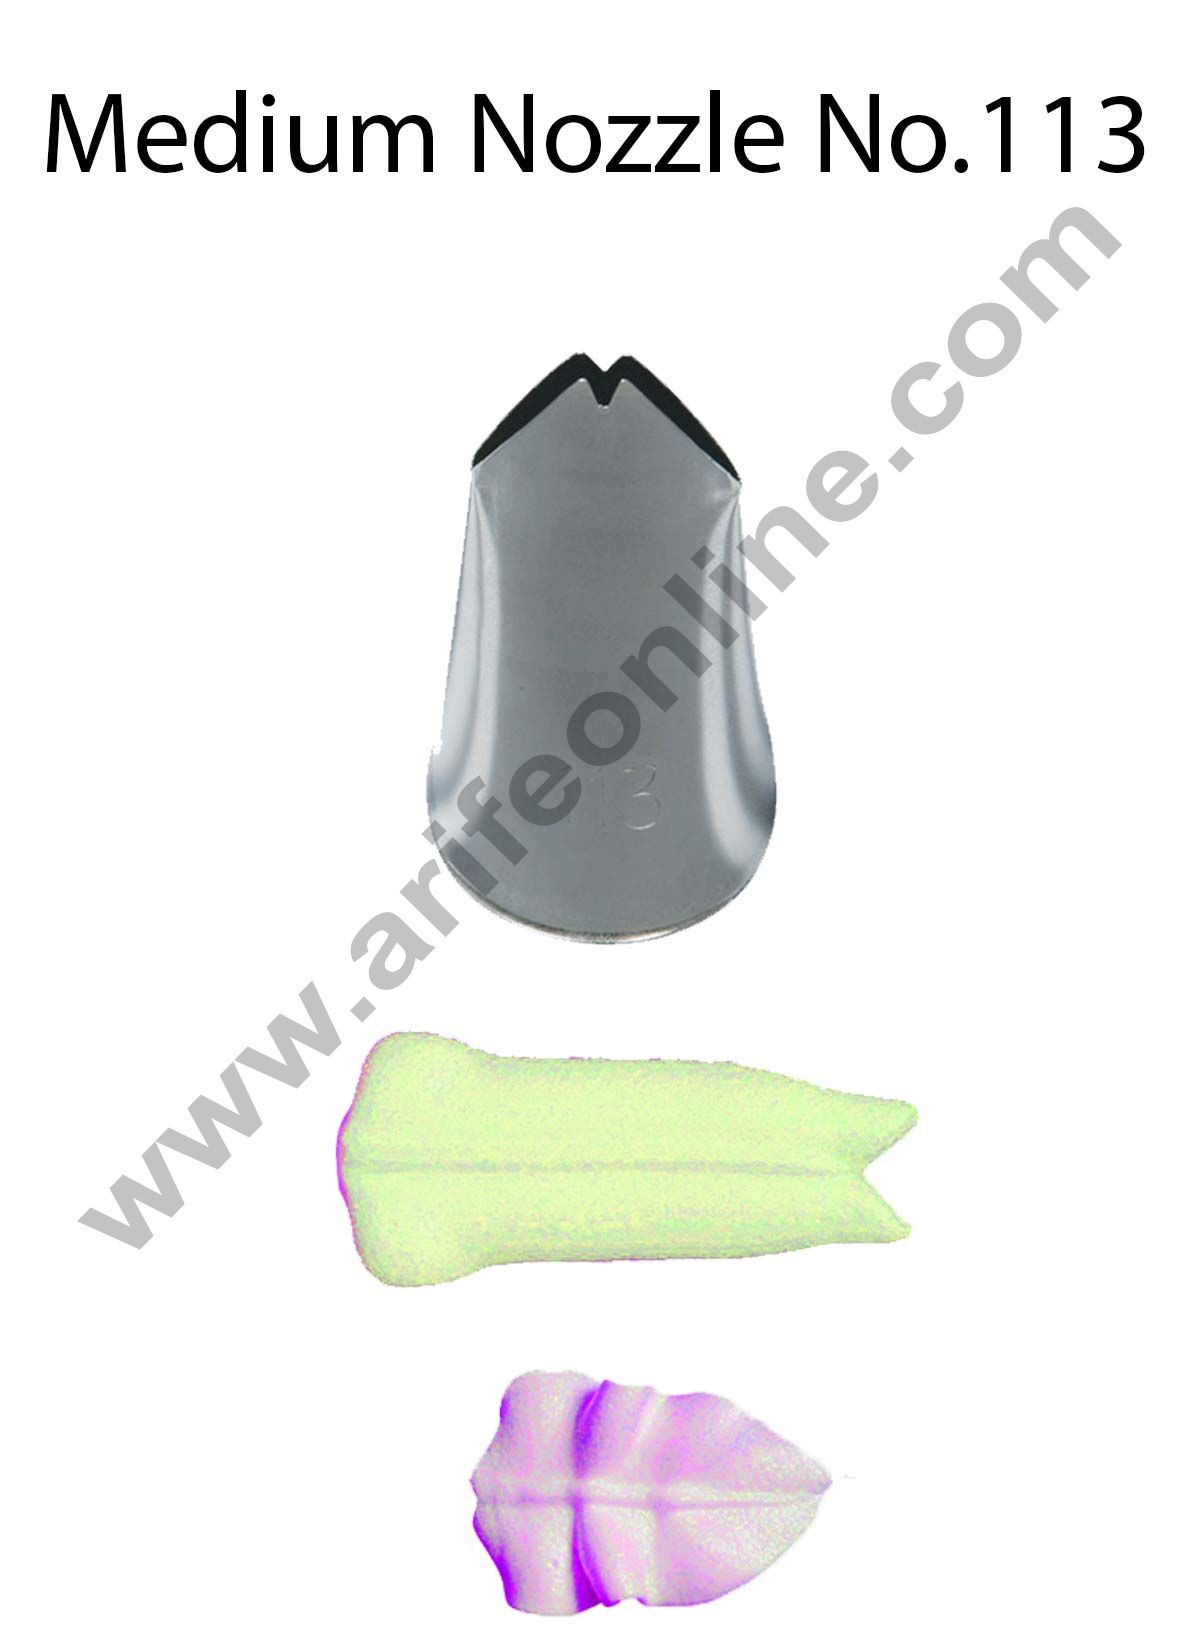 Cake Decor Medium Nozzle - No. 113 Leaf Piping Nozzle